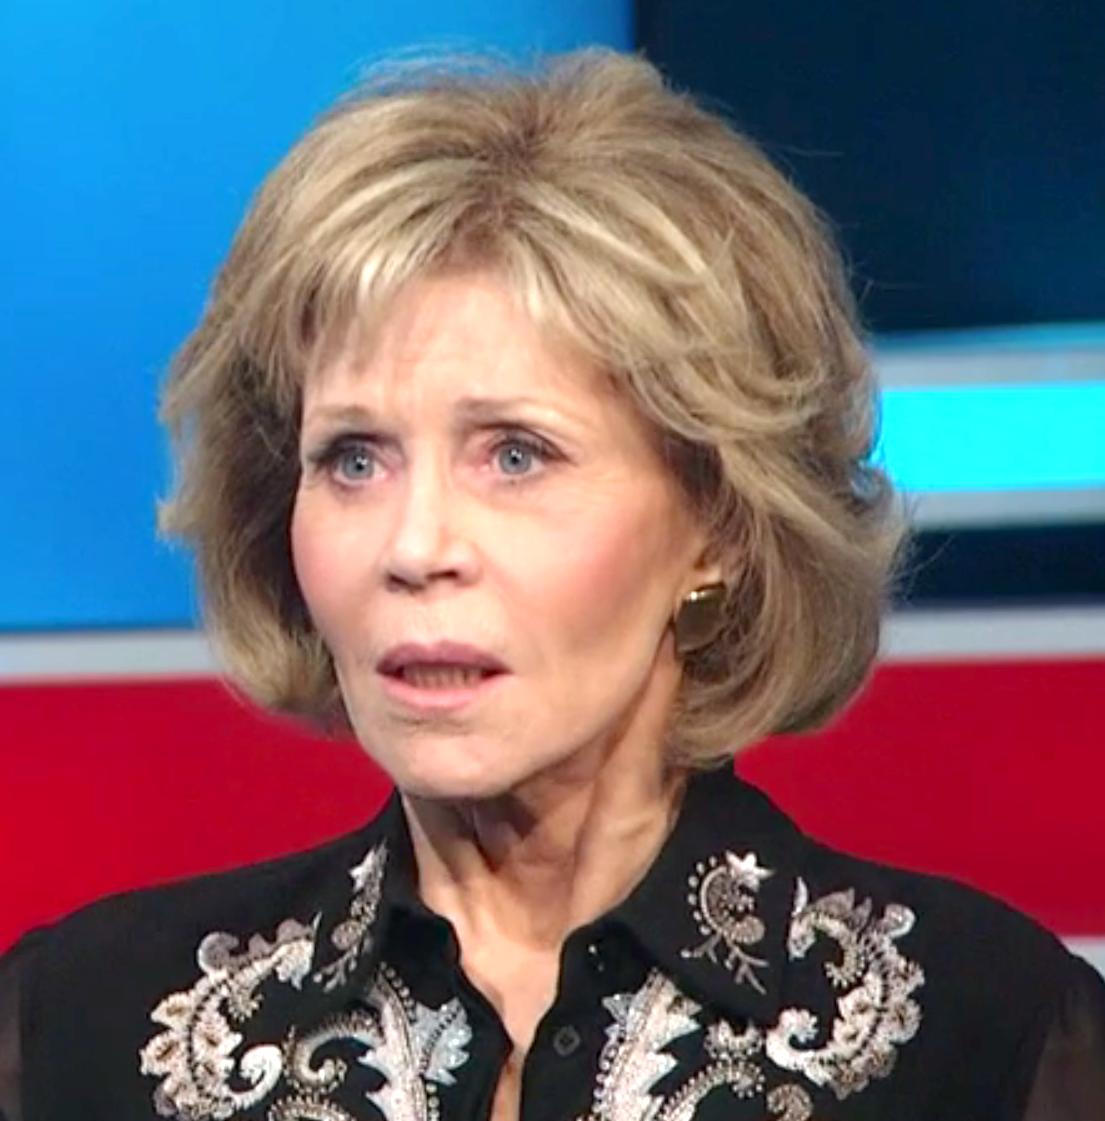 Jane Fonda 2017 Palo Alto Daily Post